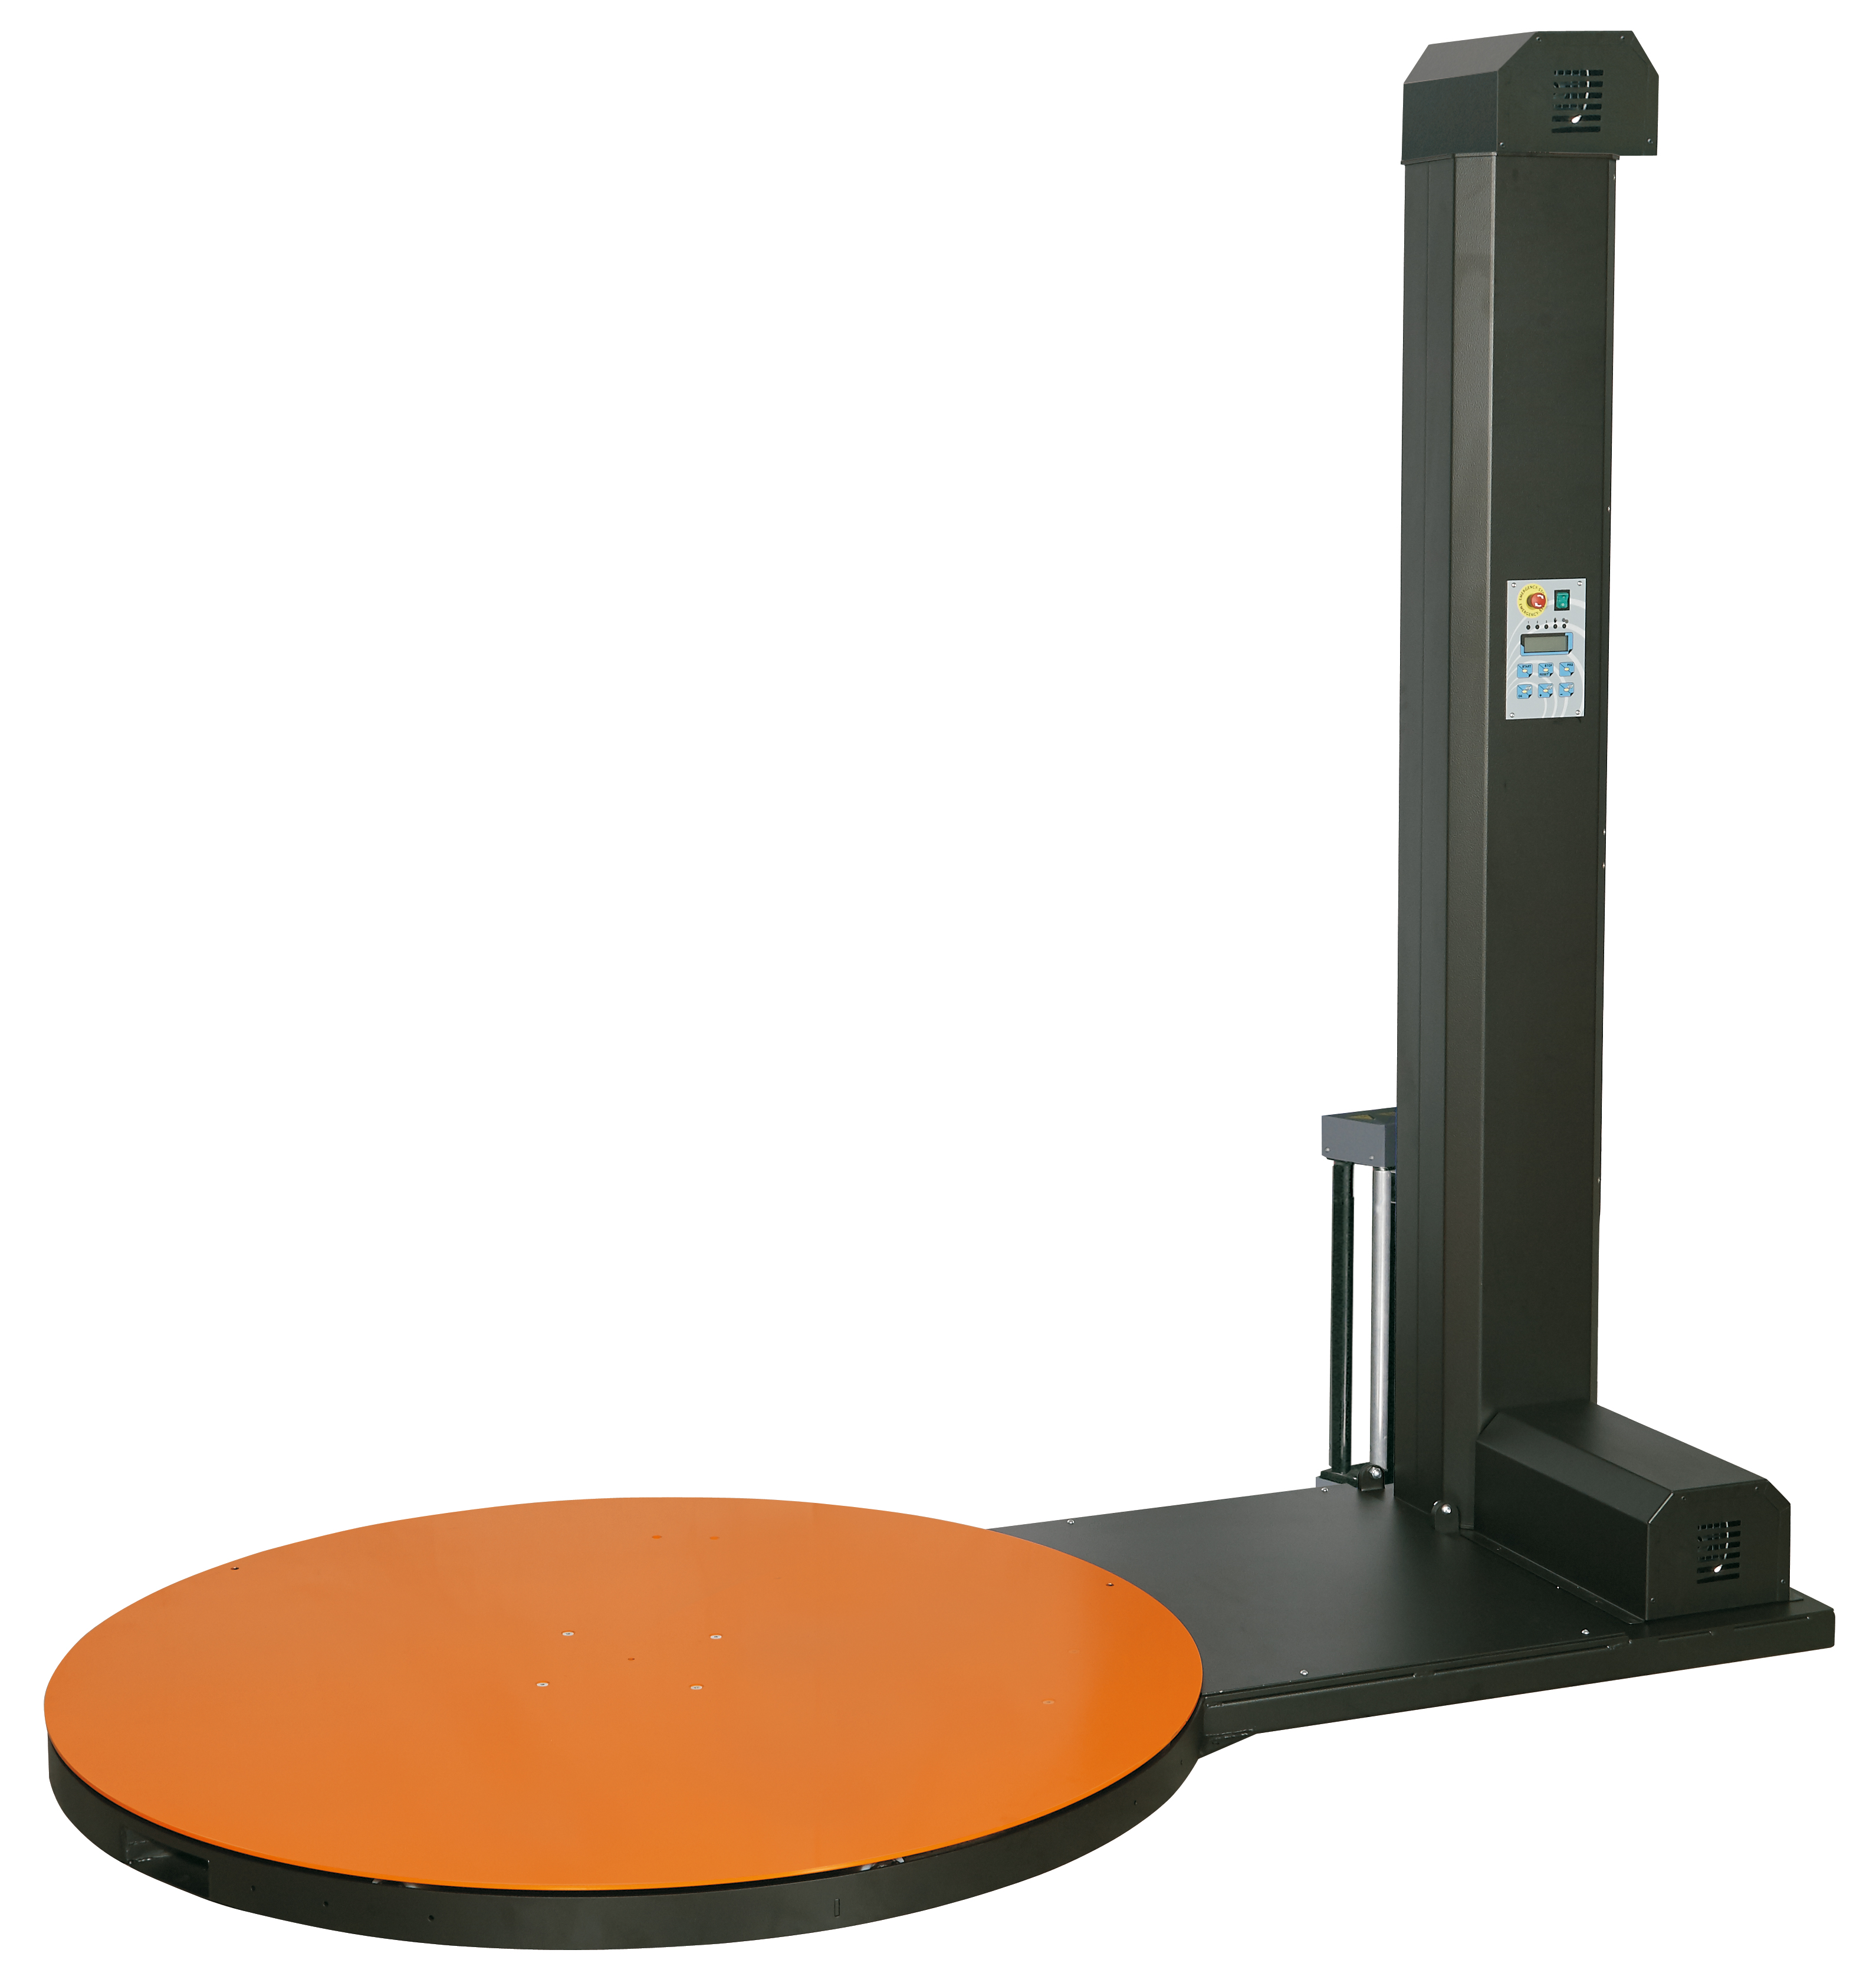 Stretchanlage PS NOBEL TOP-ANGEBOT 1500mm Drehteller, Wickelhöhe 2100mm | günstig bestellen bei assistYourwork